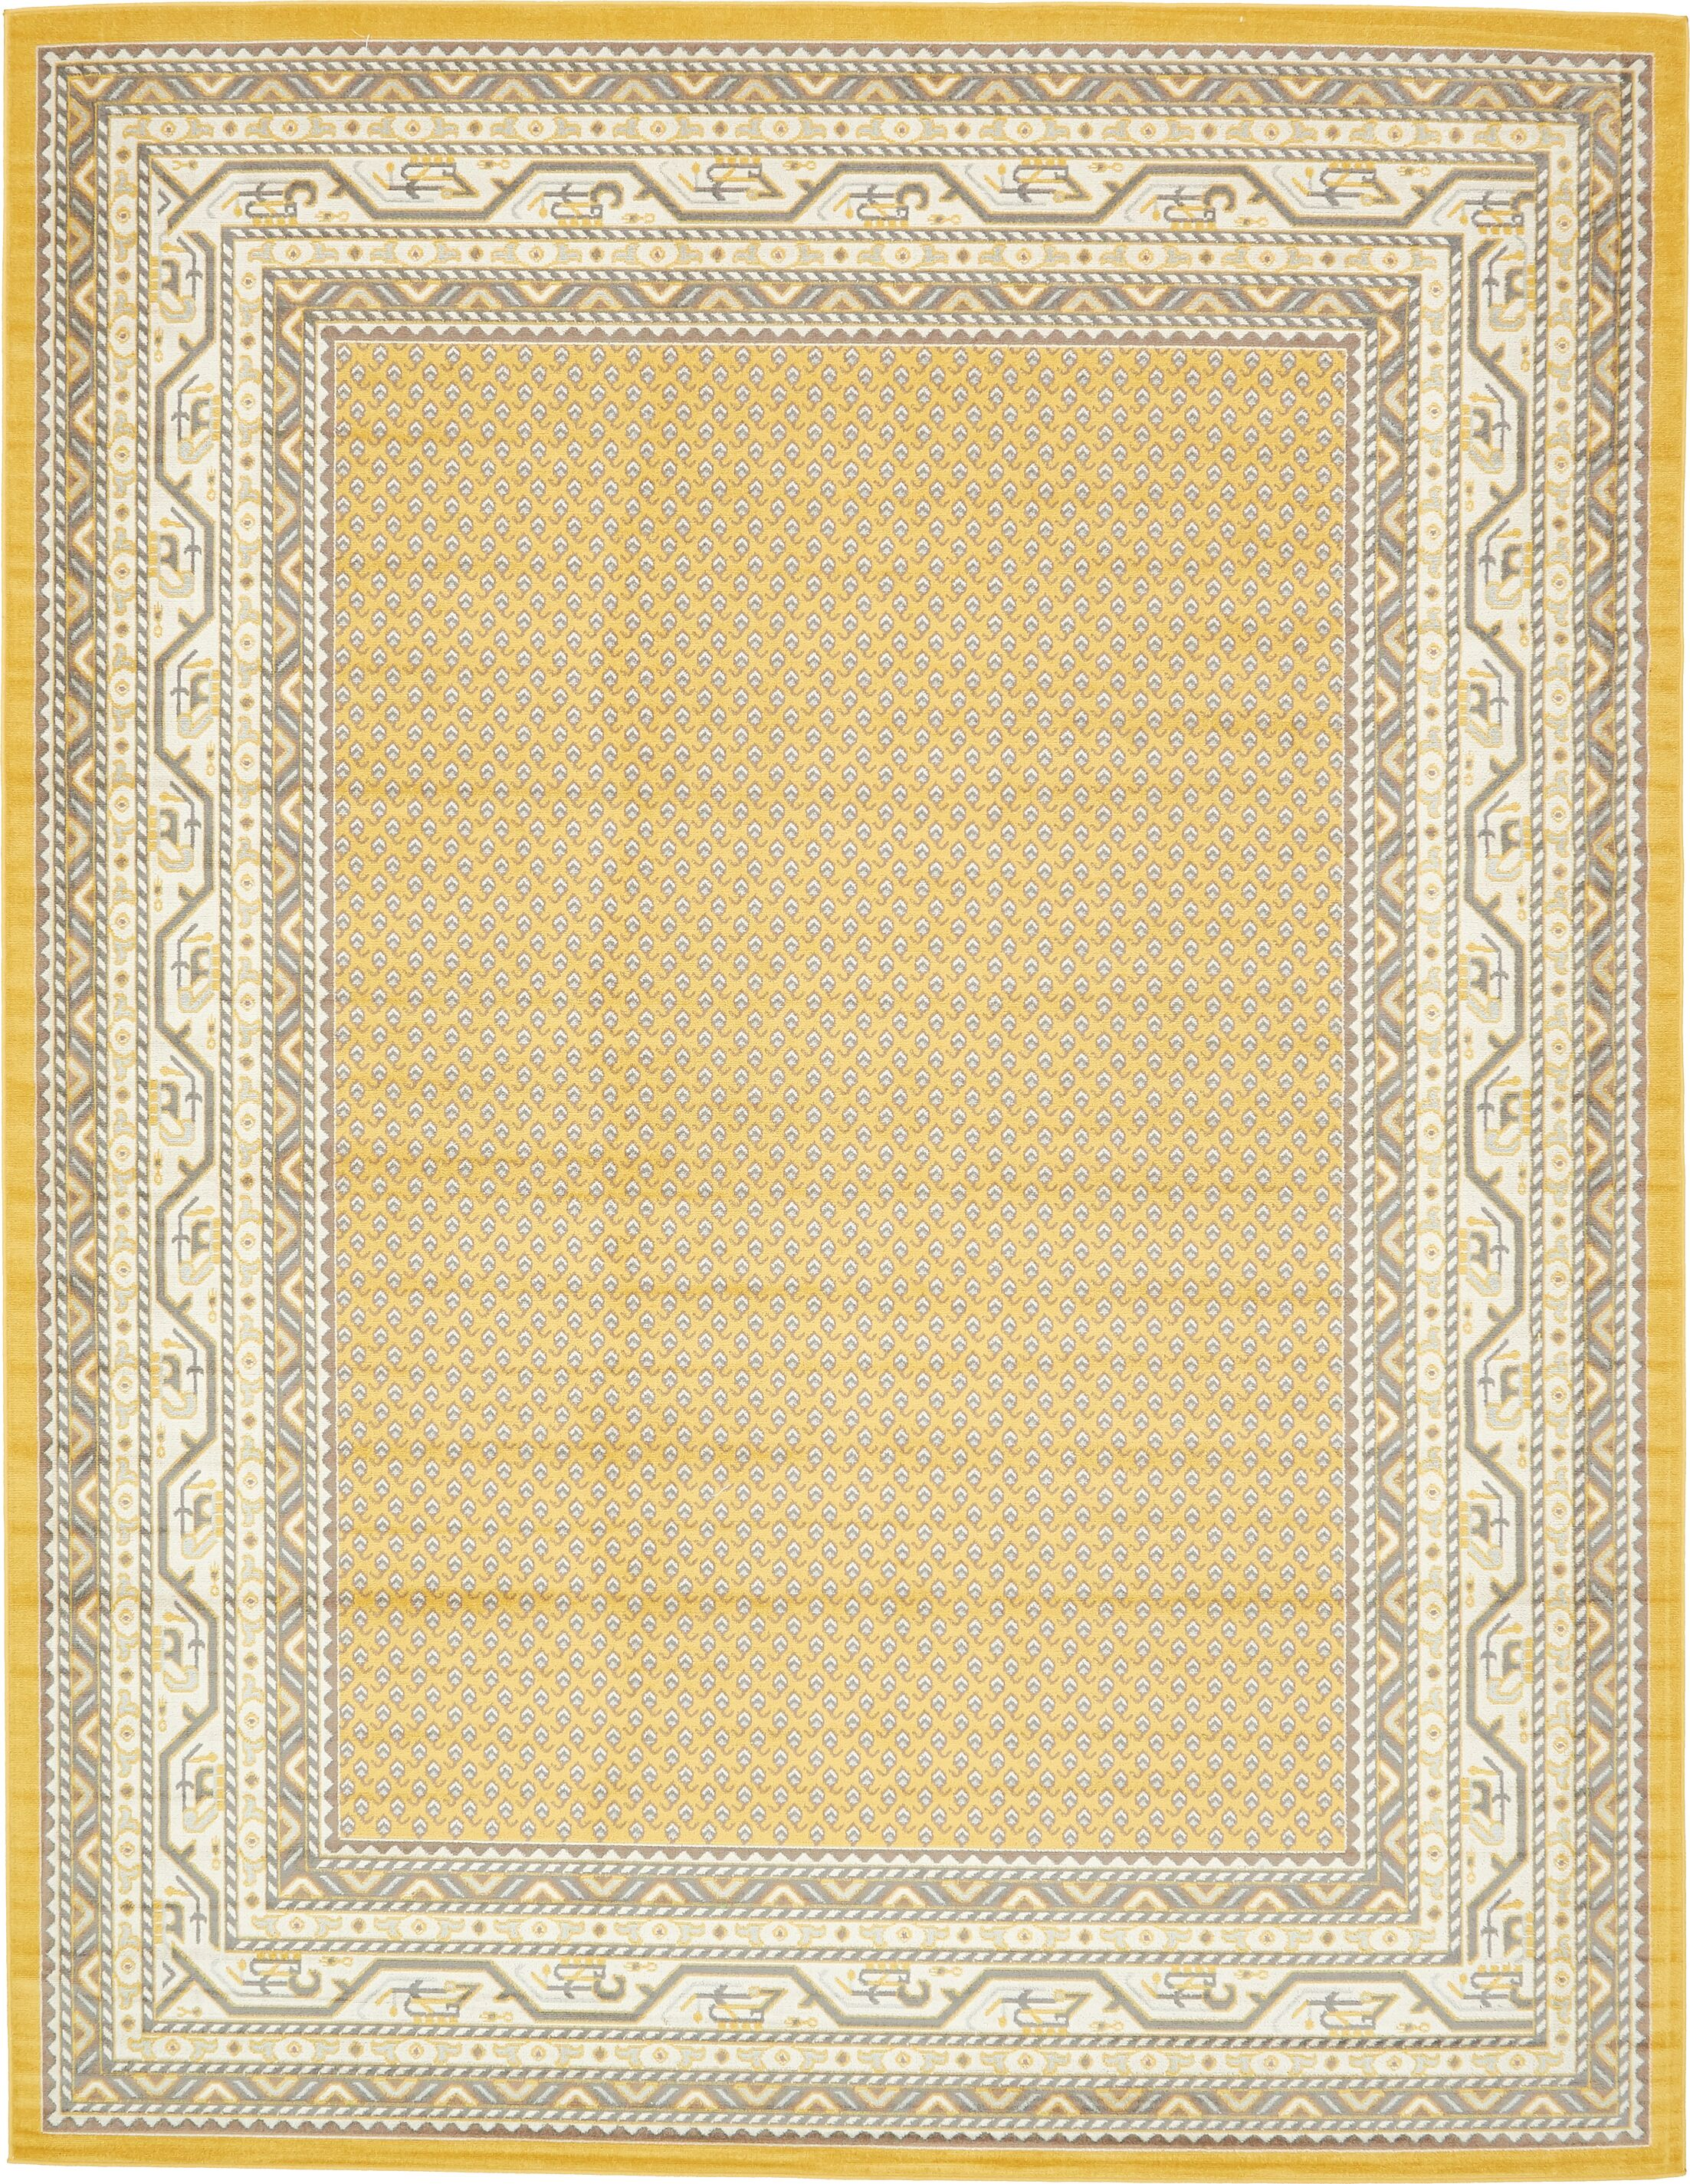 Gillam Yellow Area Rug Rug Size: Rectangle 10' x 13'